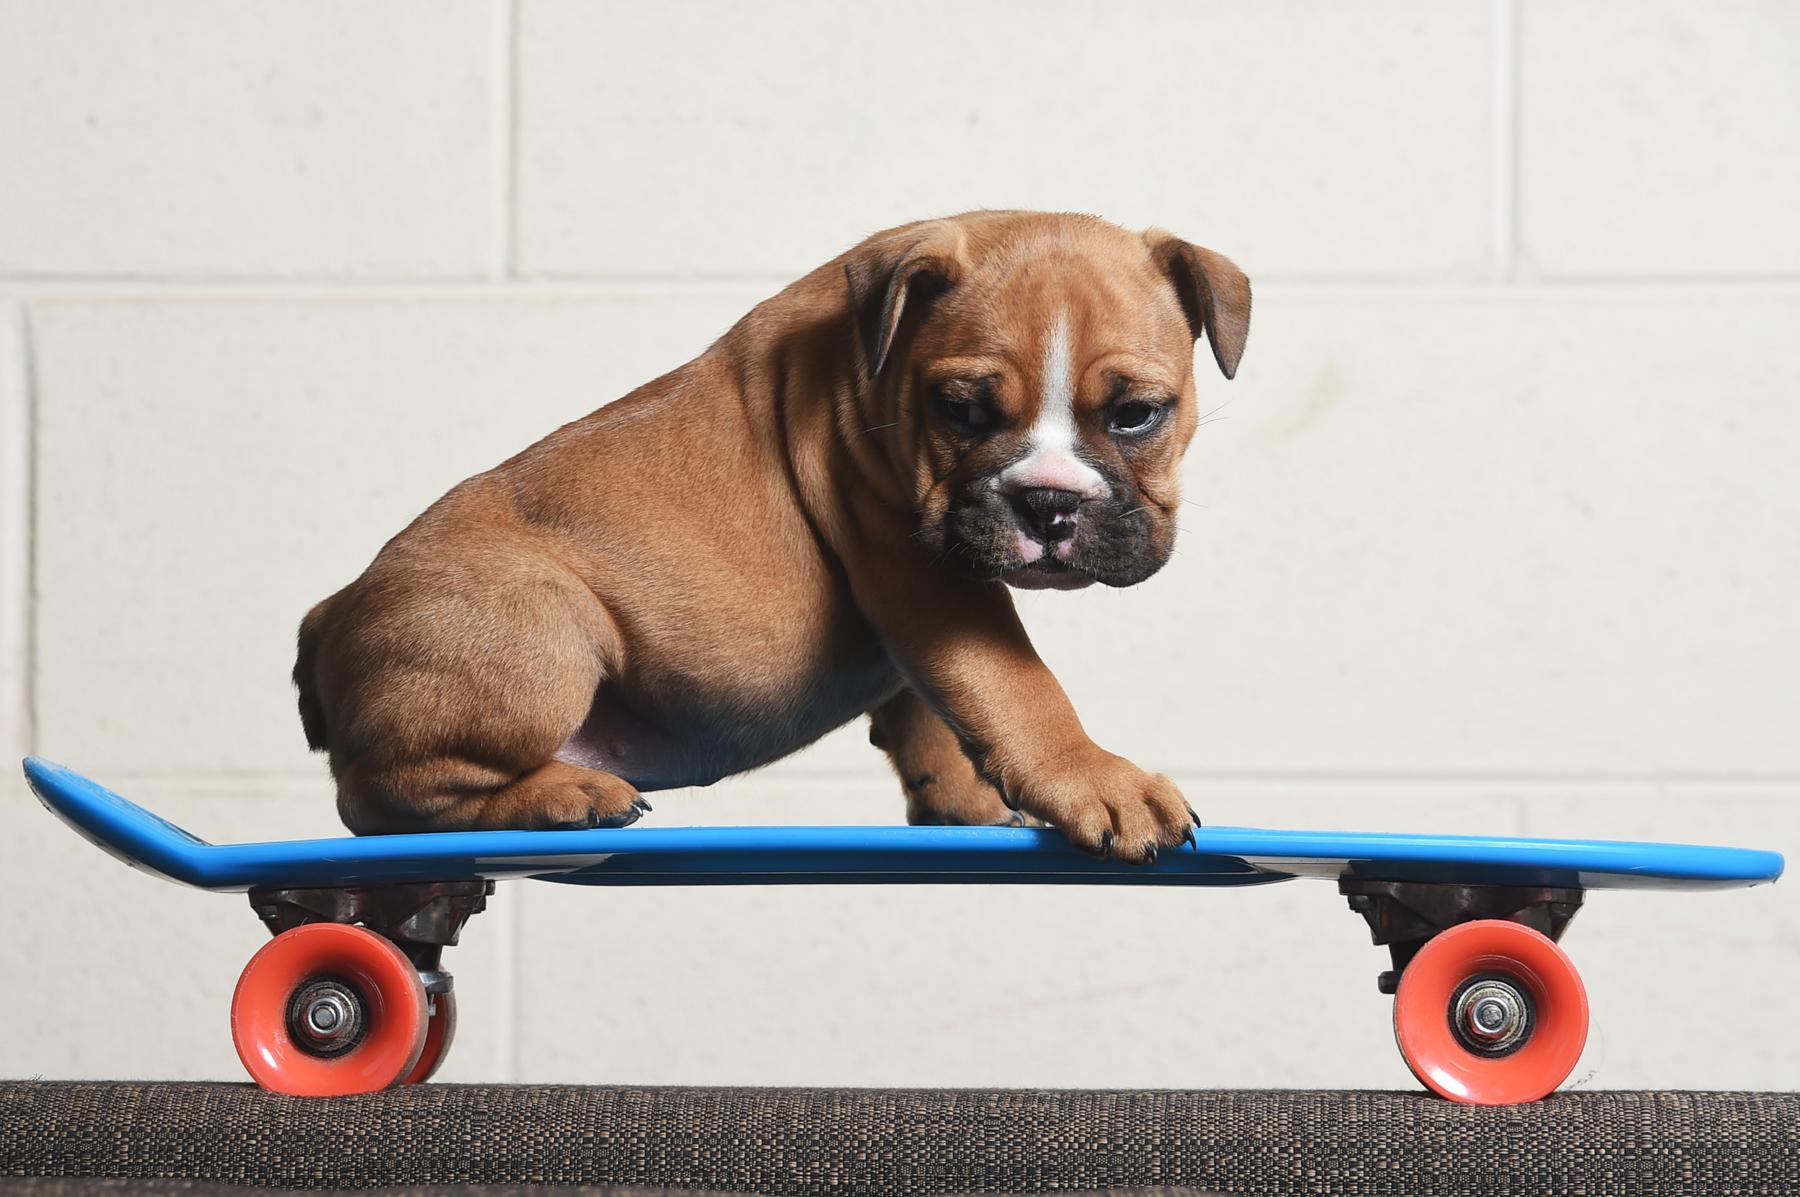 CHP_Export_121533012_Six-week-old Australian Bulldog puppy Charlie-Jaxon could be the next skate boa.jpg